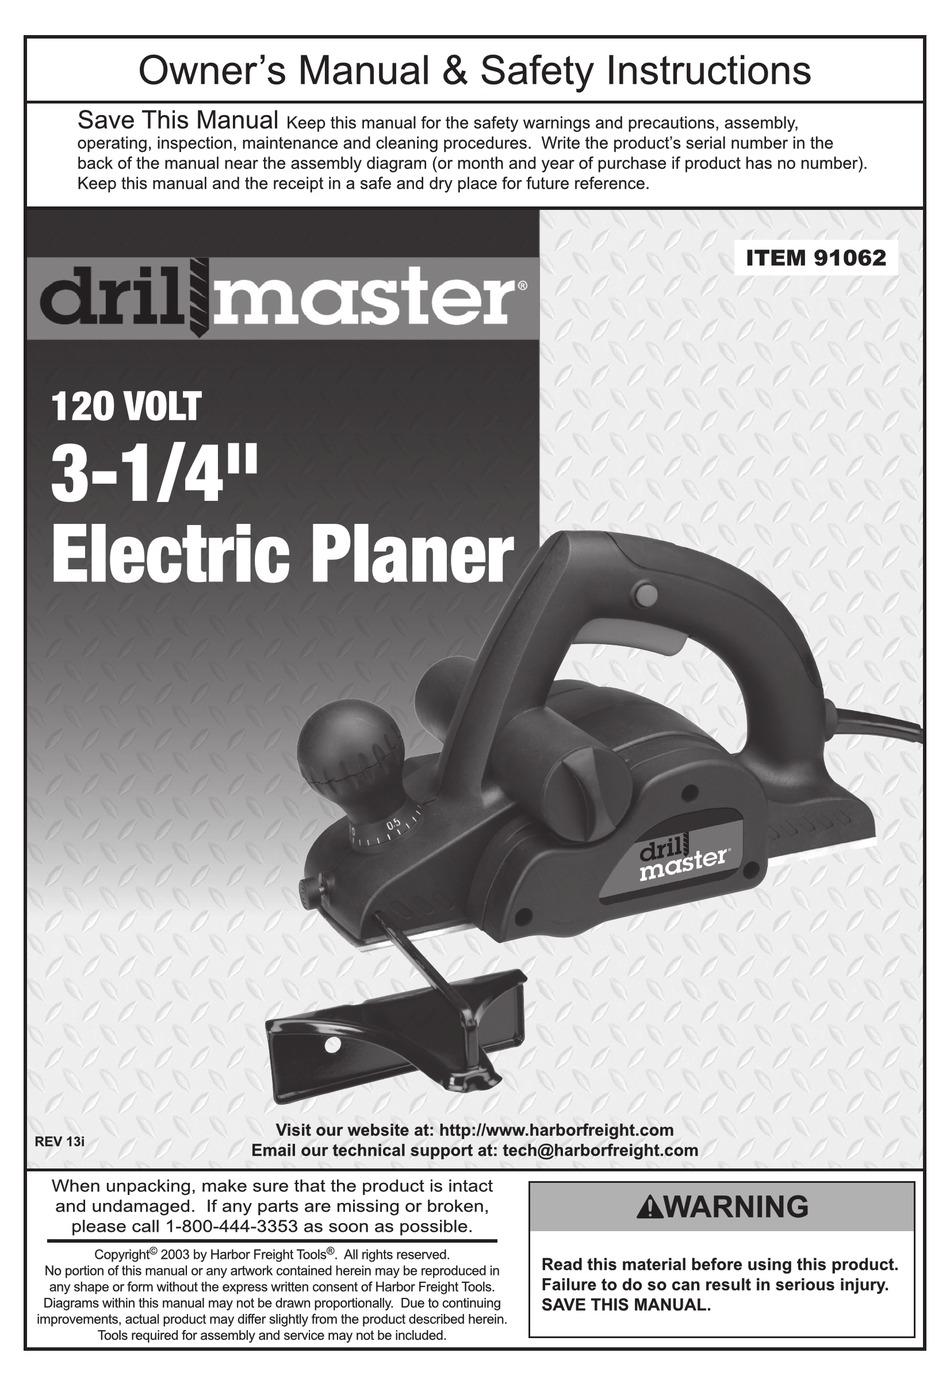 DRILL MASTER 91062 OWNER'S MANUAL & SAFETY INSTRUCTIONS Pdf Download |  ManualsLibManualsLib